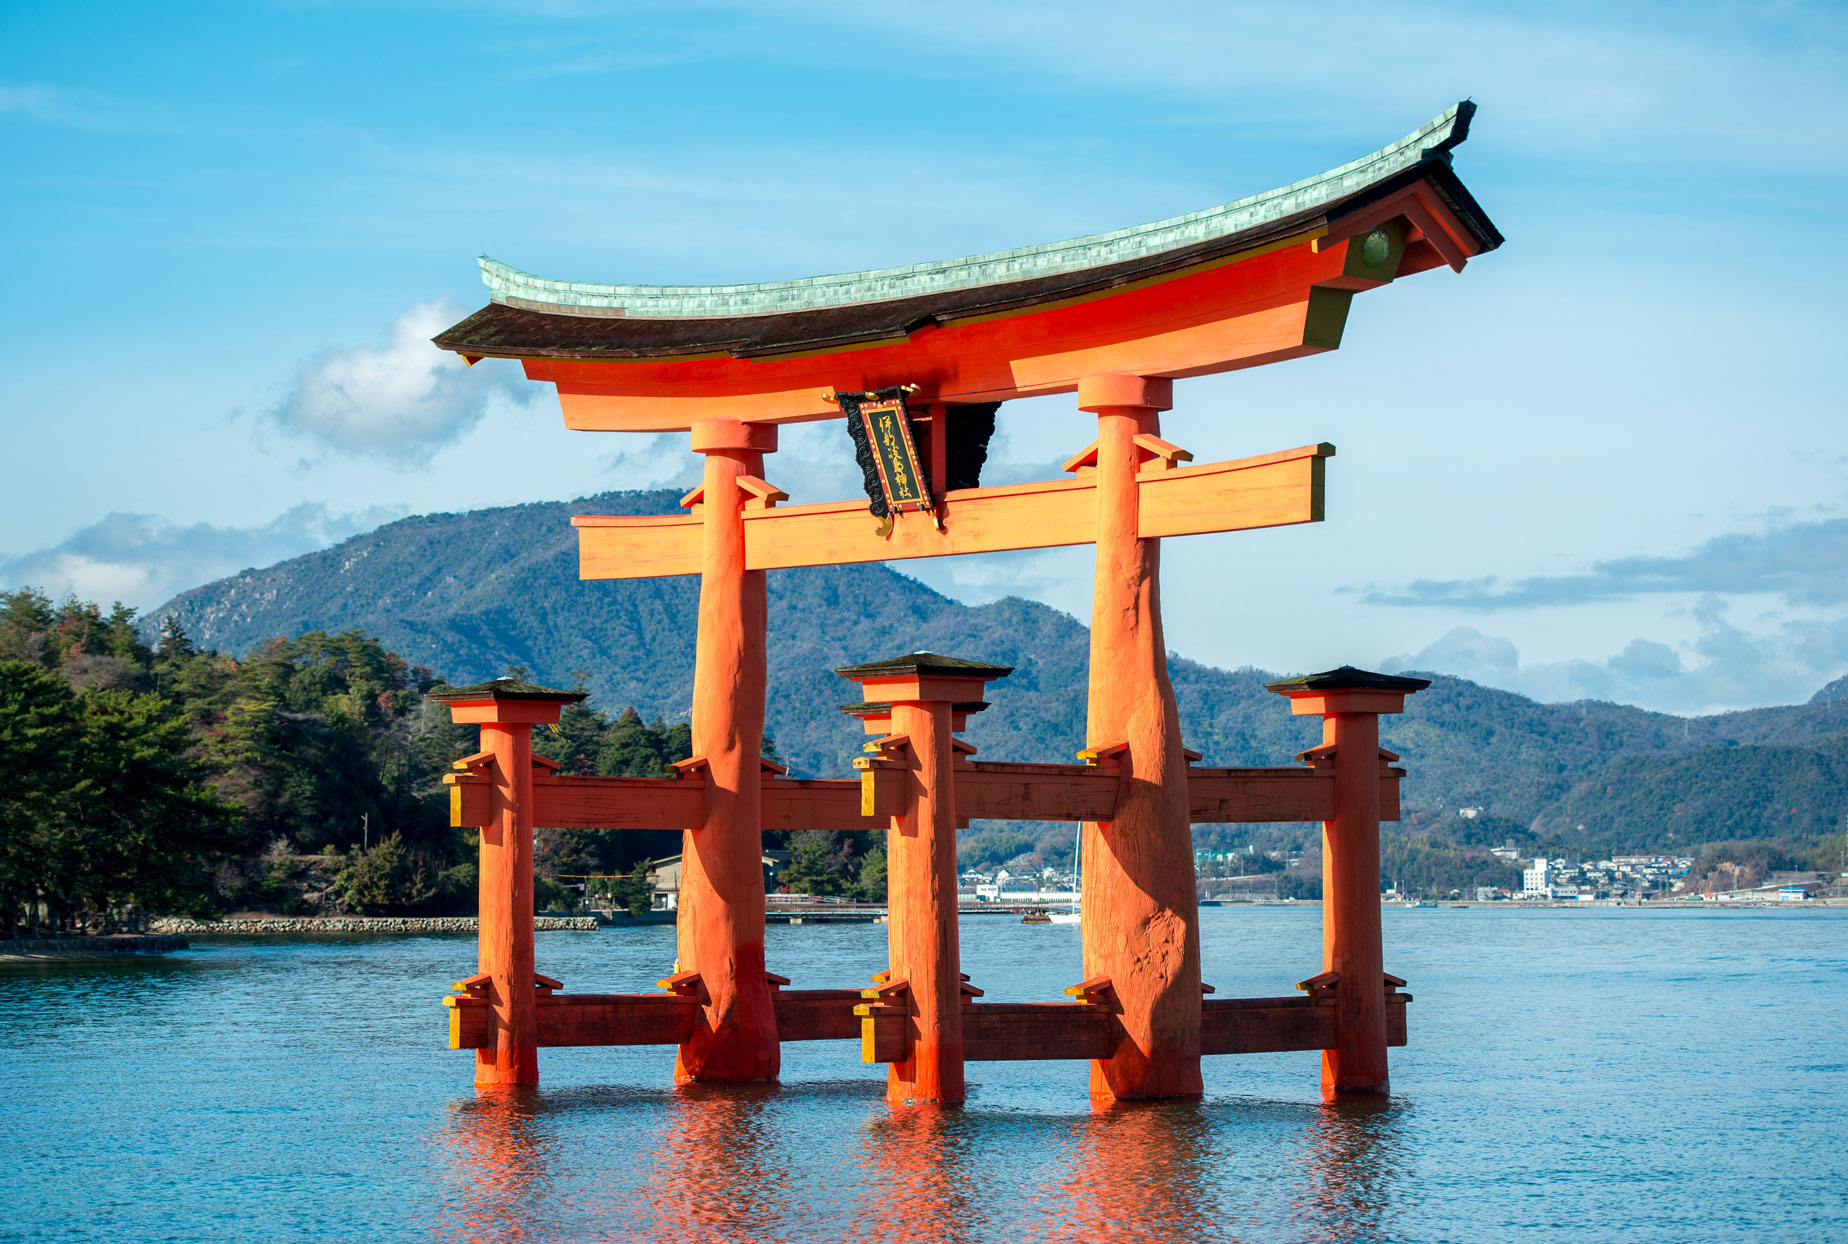 The Great Torii at Miyajima